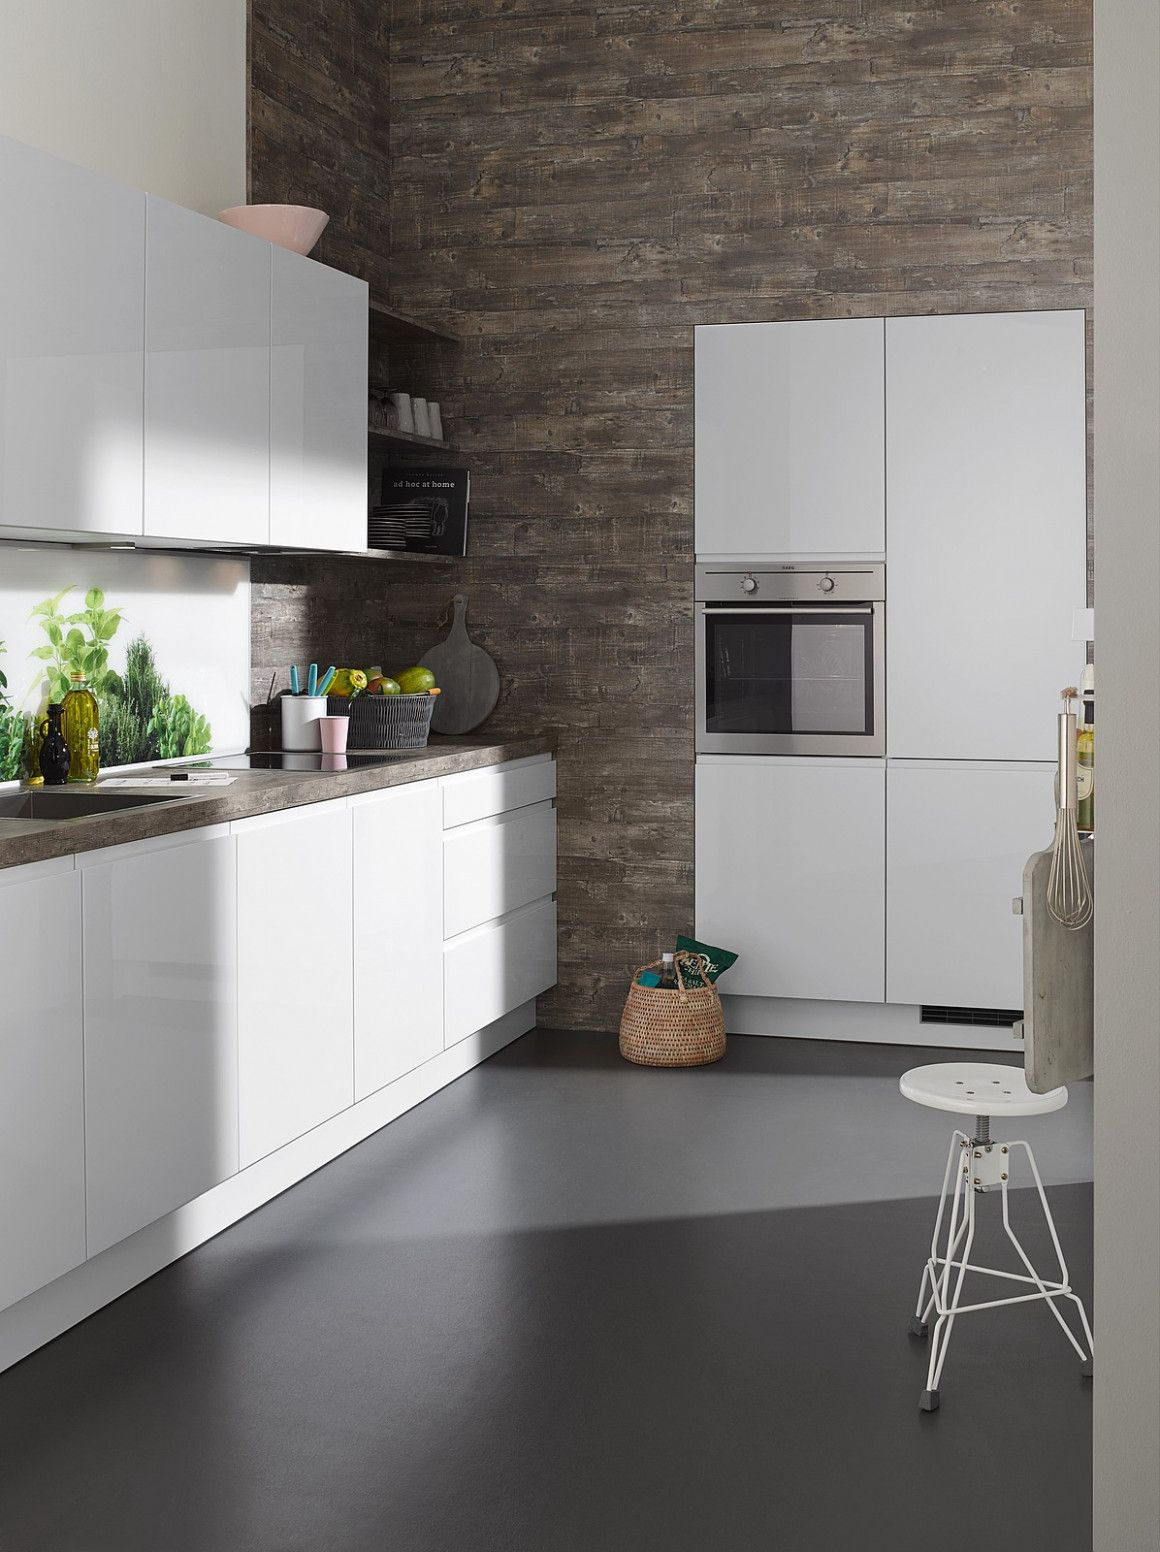 14 Kuche Weiss Boden Grau In 2020 Weisse Kuche Nolte Kuche Moderne Kuche